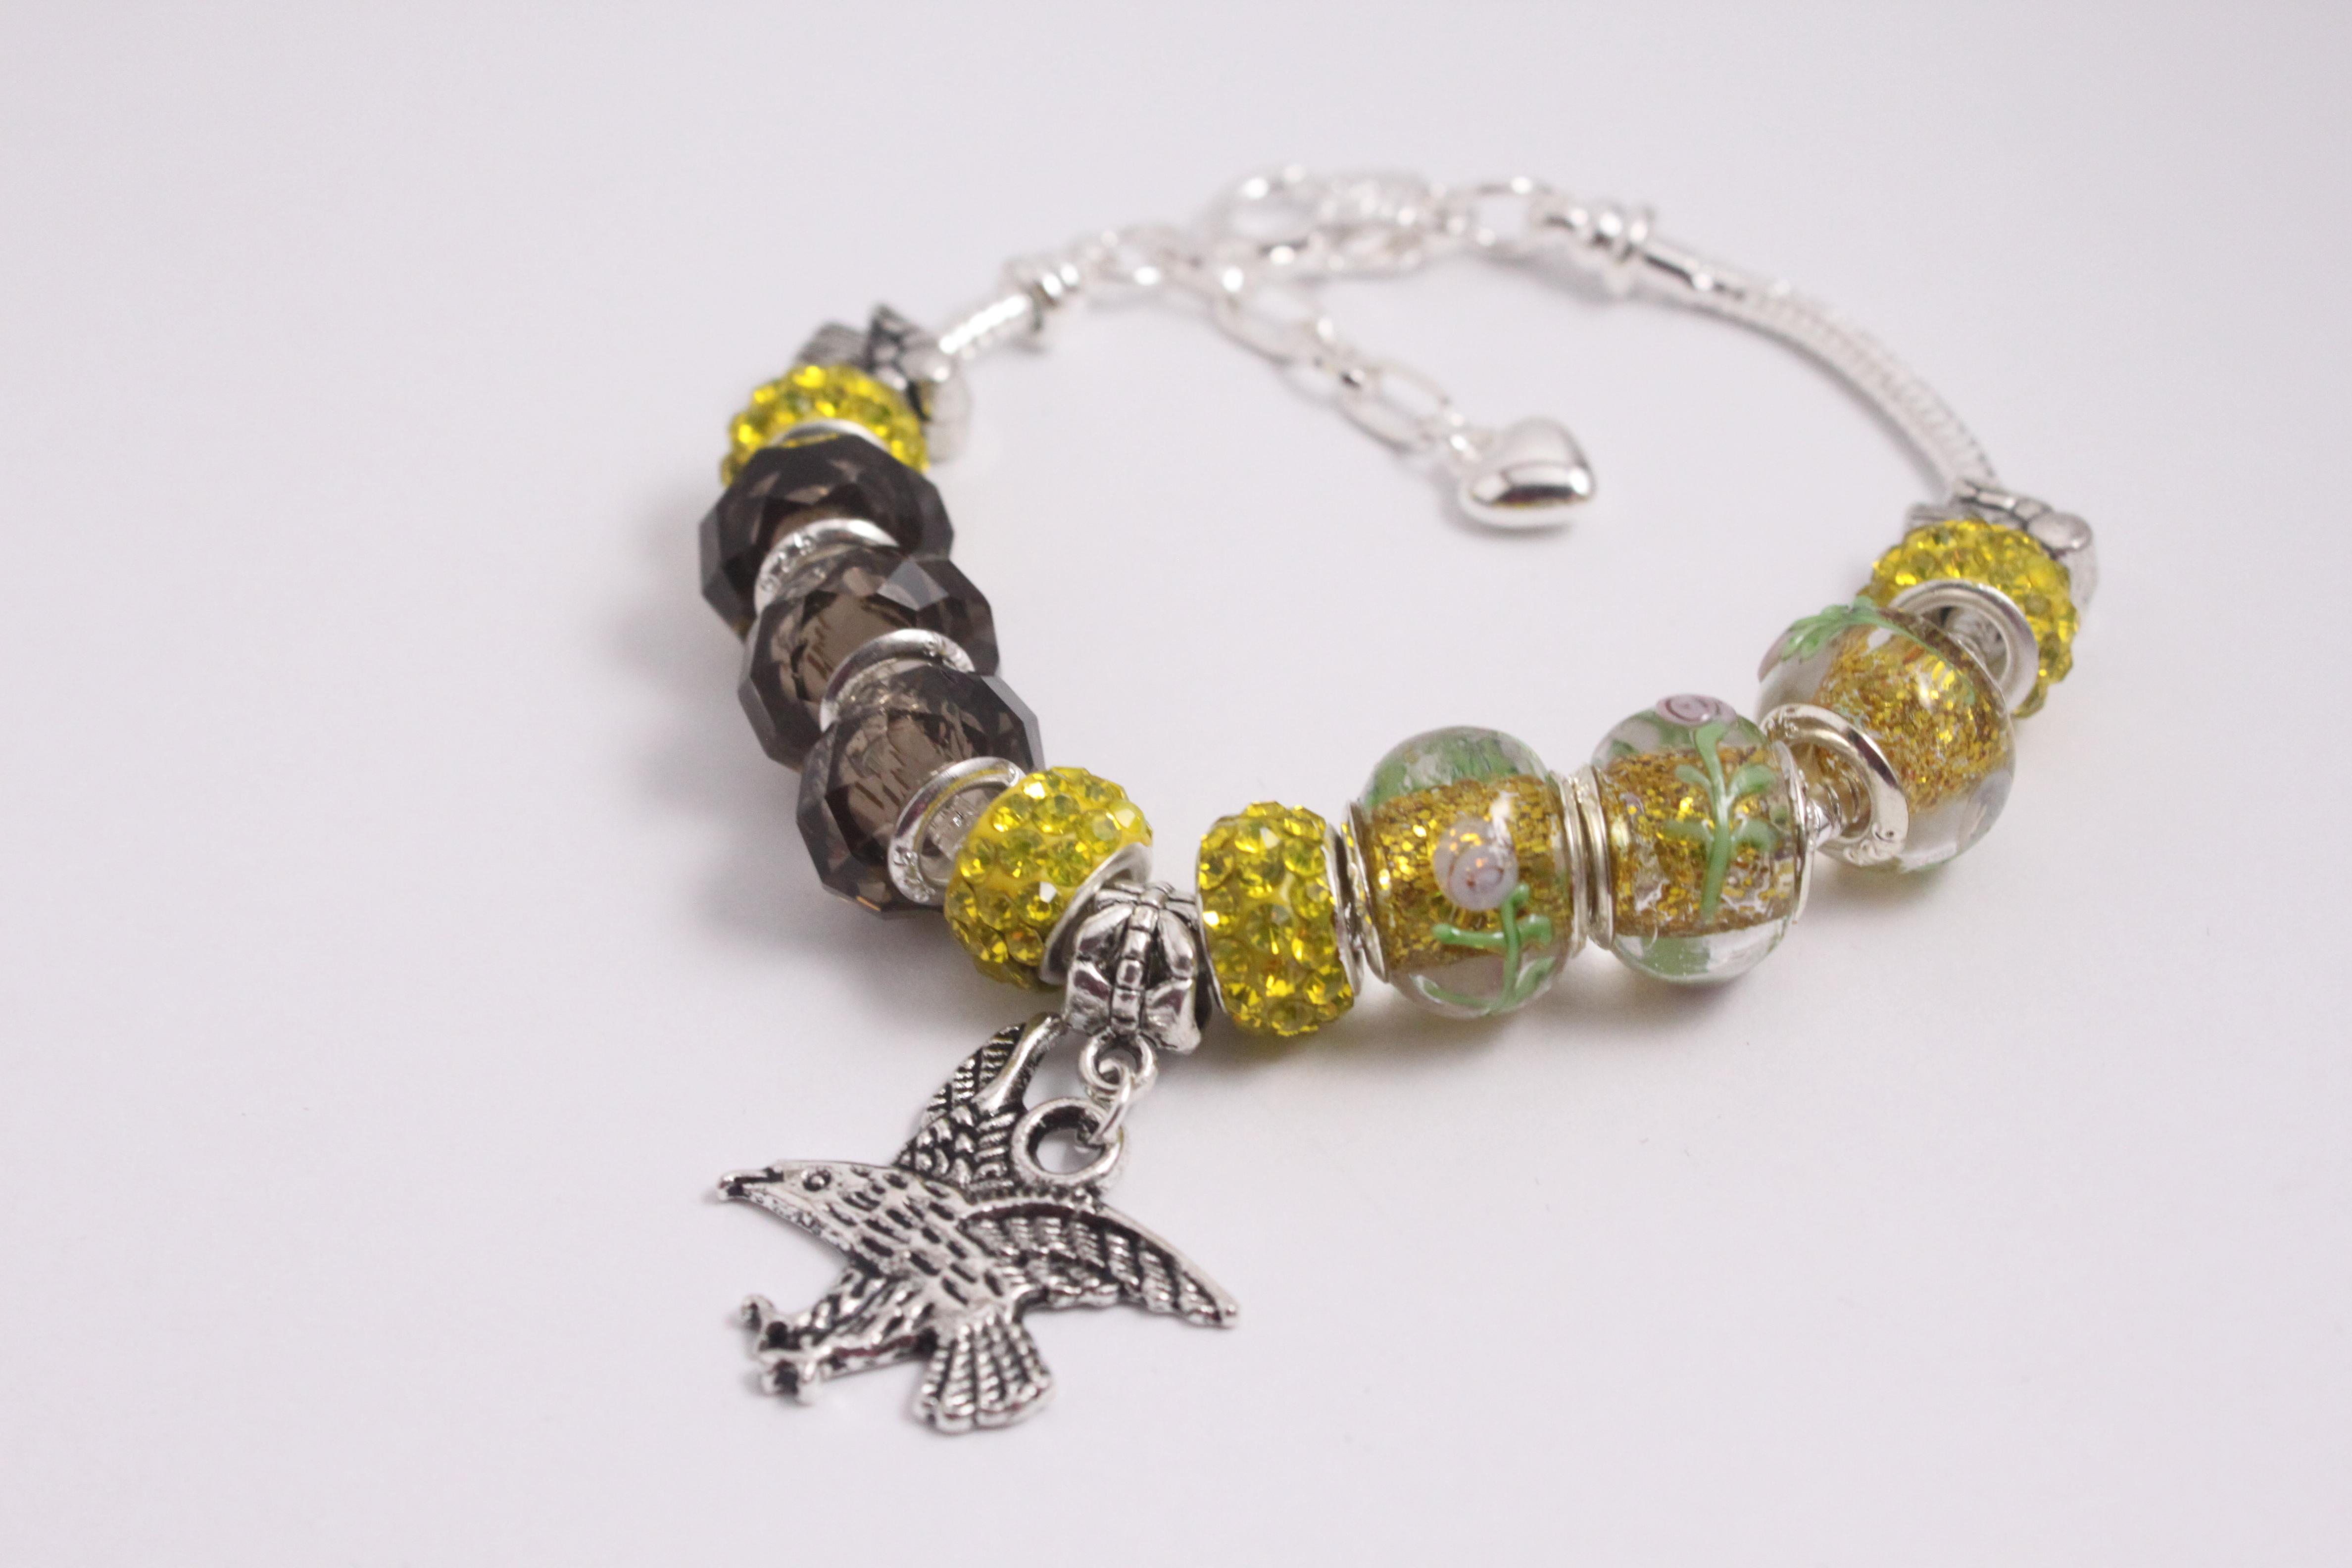 Bird charm bracelet - yellow